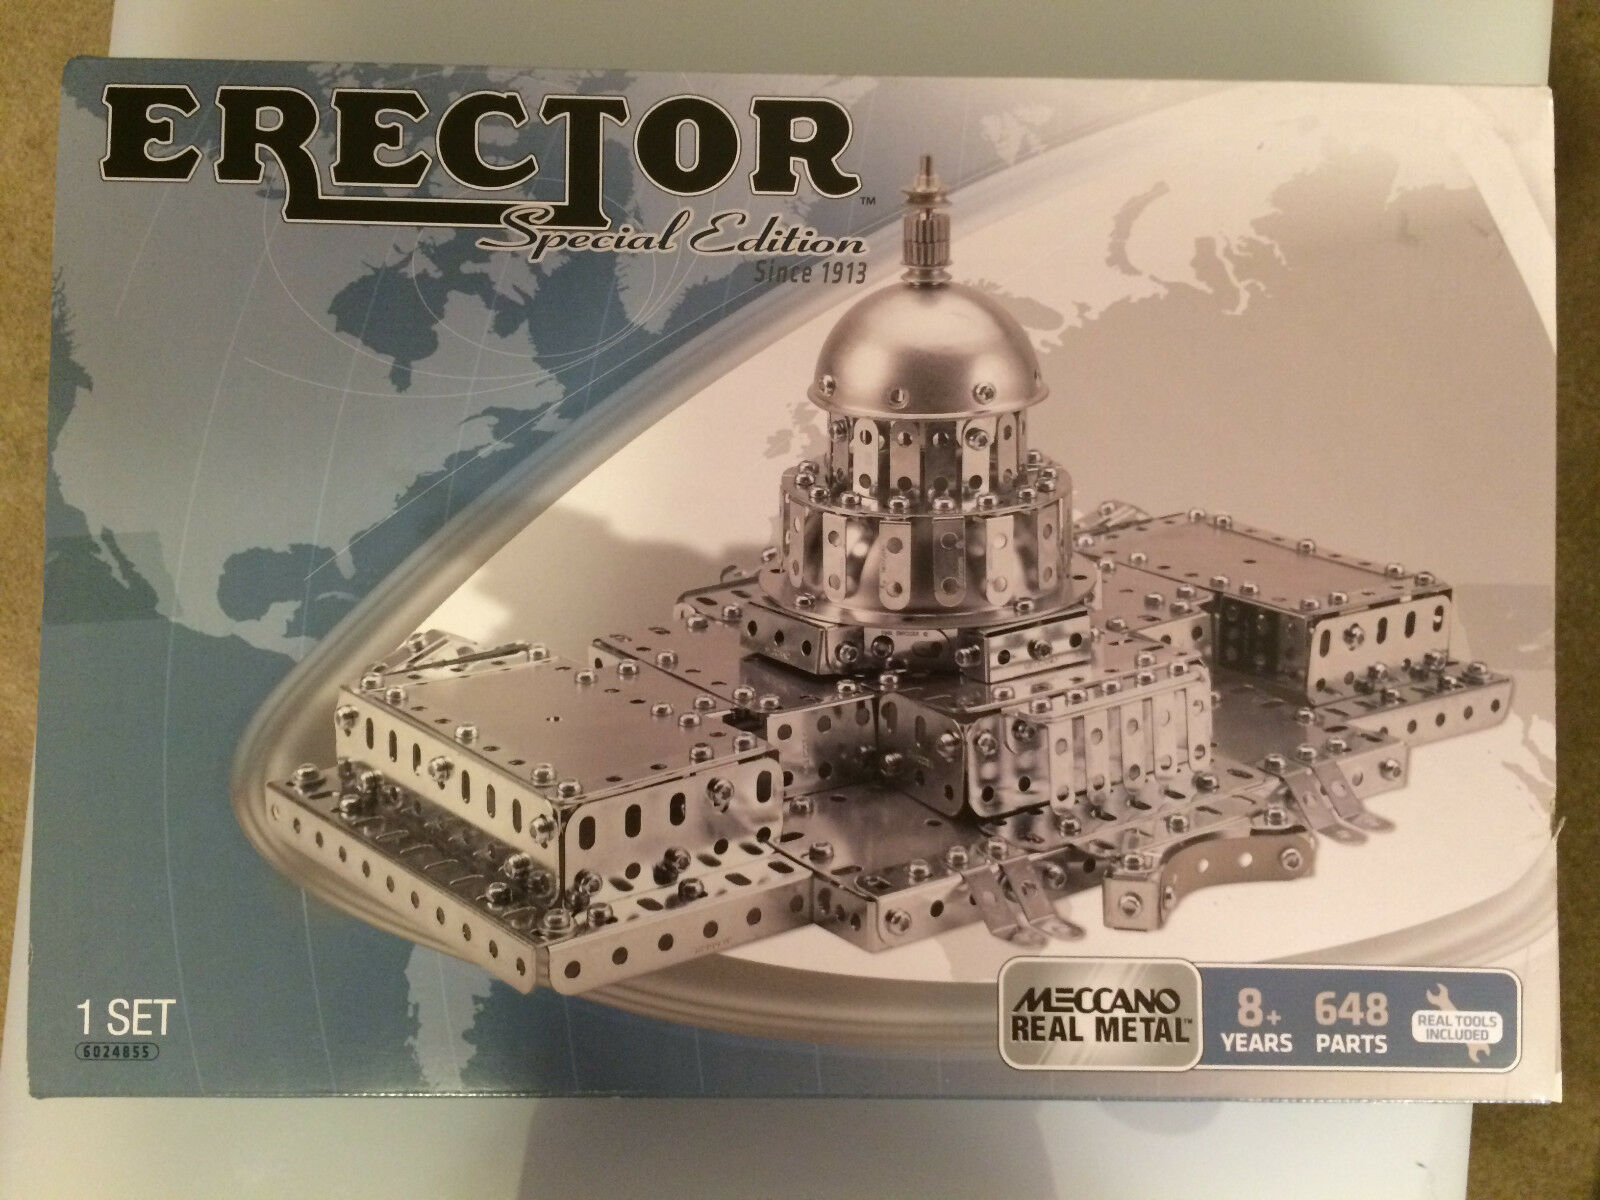 Meccano Erector Set Limited Edition Capitol Hill Building Set 648 Pcs New in Box